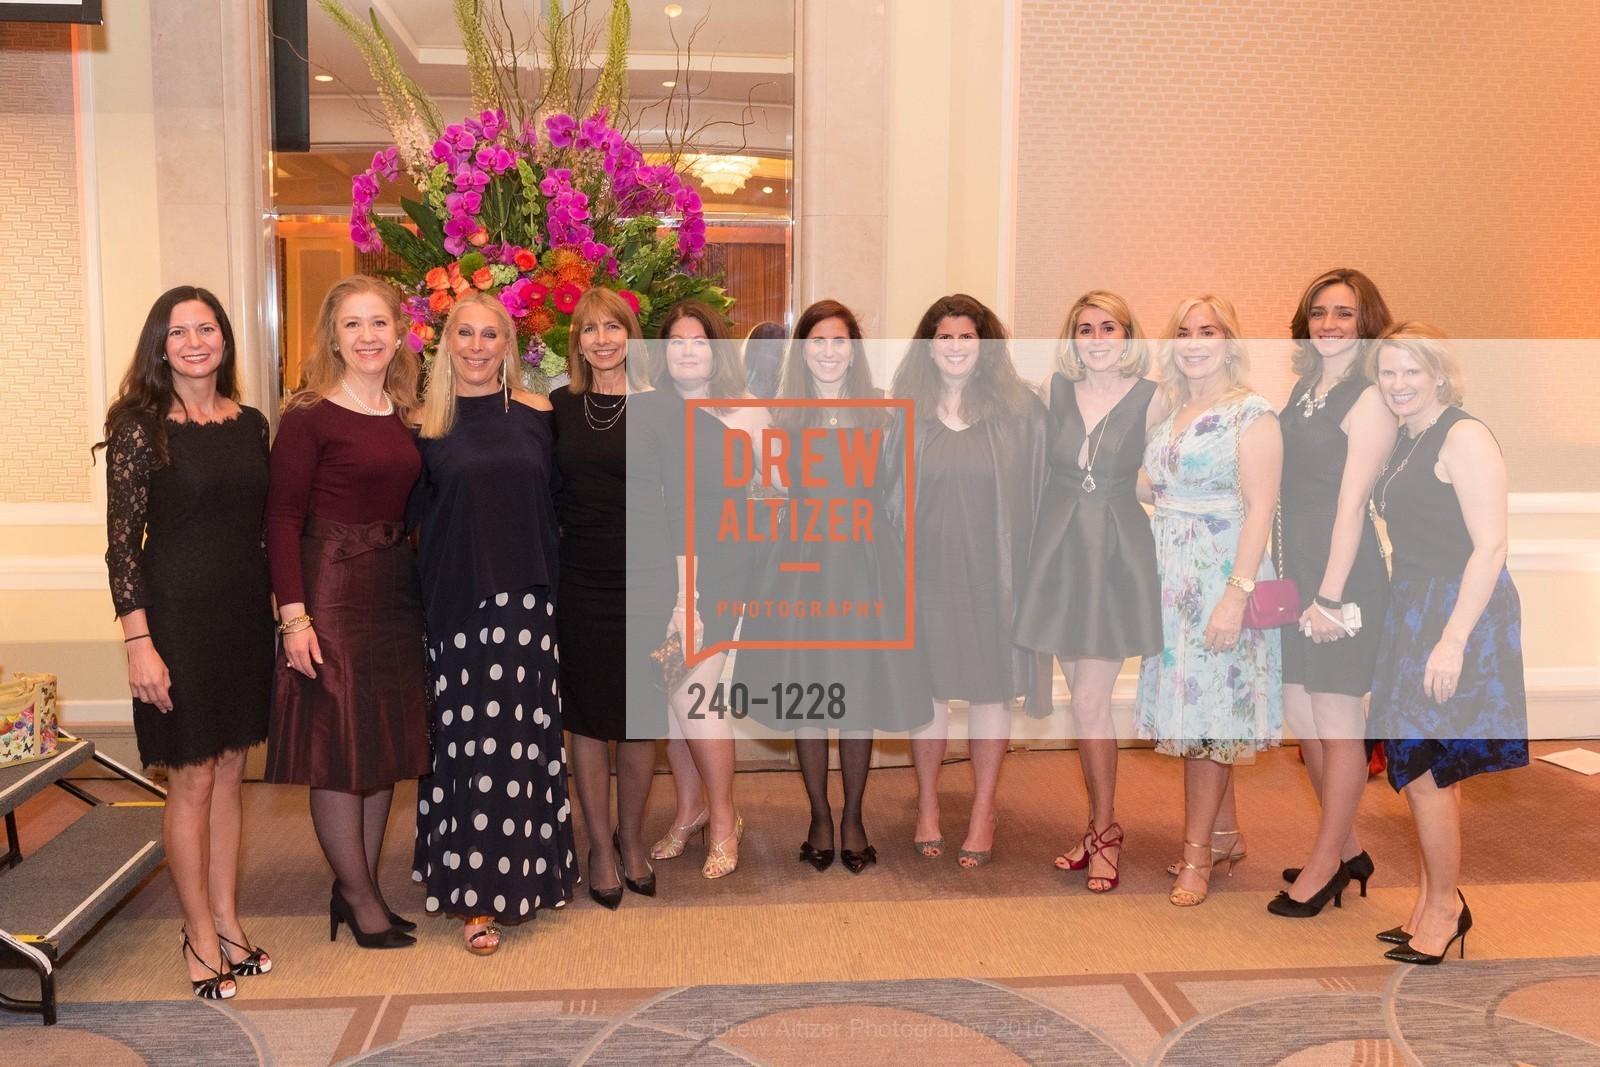 Selin Wold, Carol Benz, Betsy Linder, Carol Louie, Michelle Gilman-Jasen, Amy Wender-Hoch, Pam Zaragoza, Marie Hurabiell, Photo #240-1228